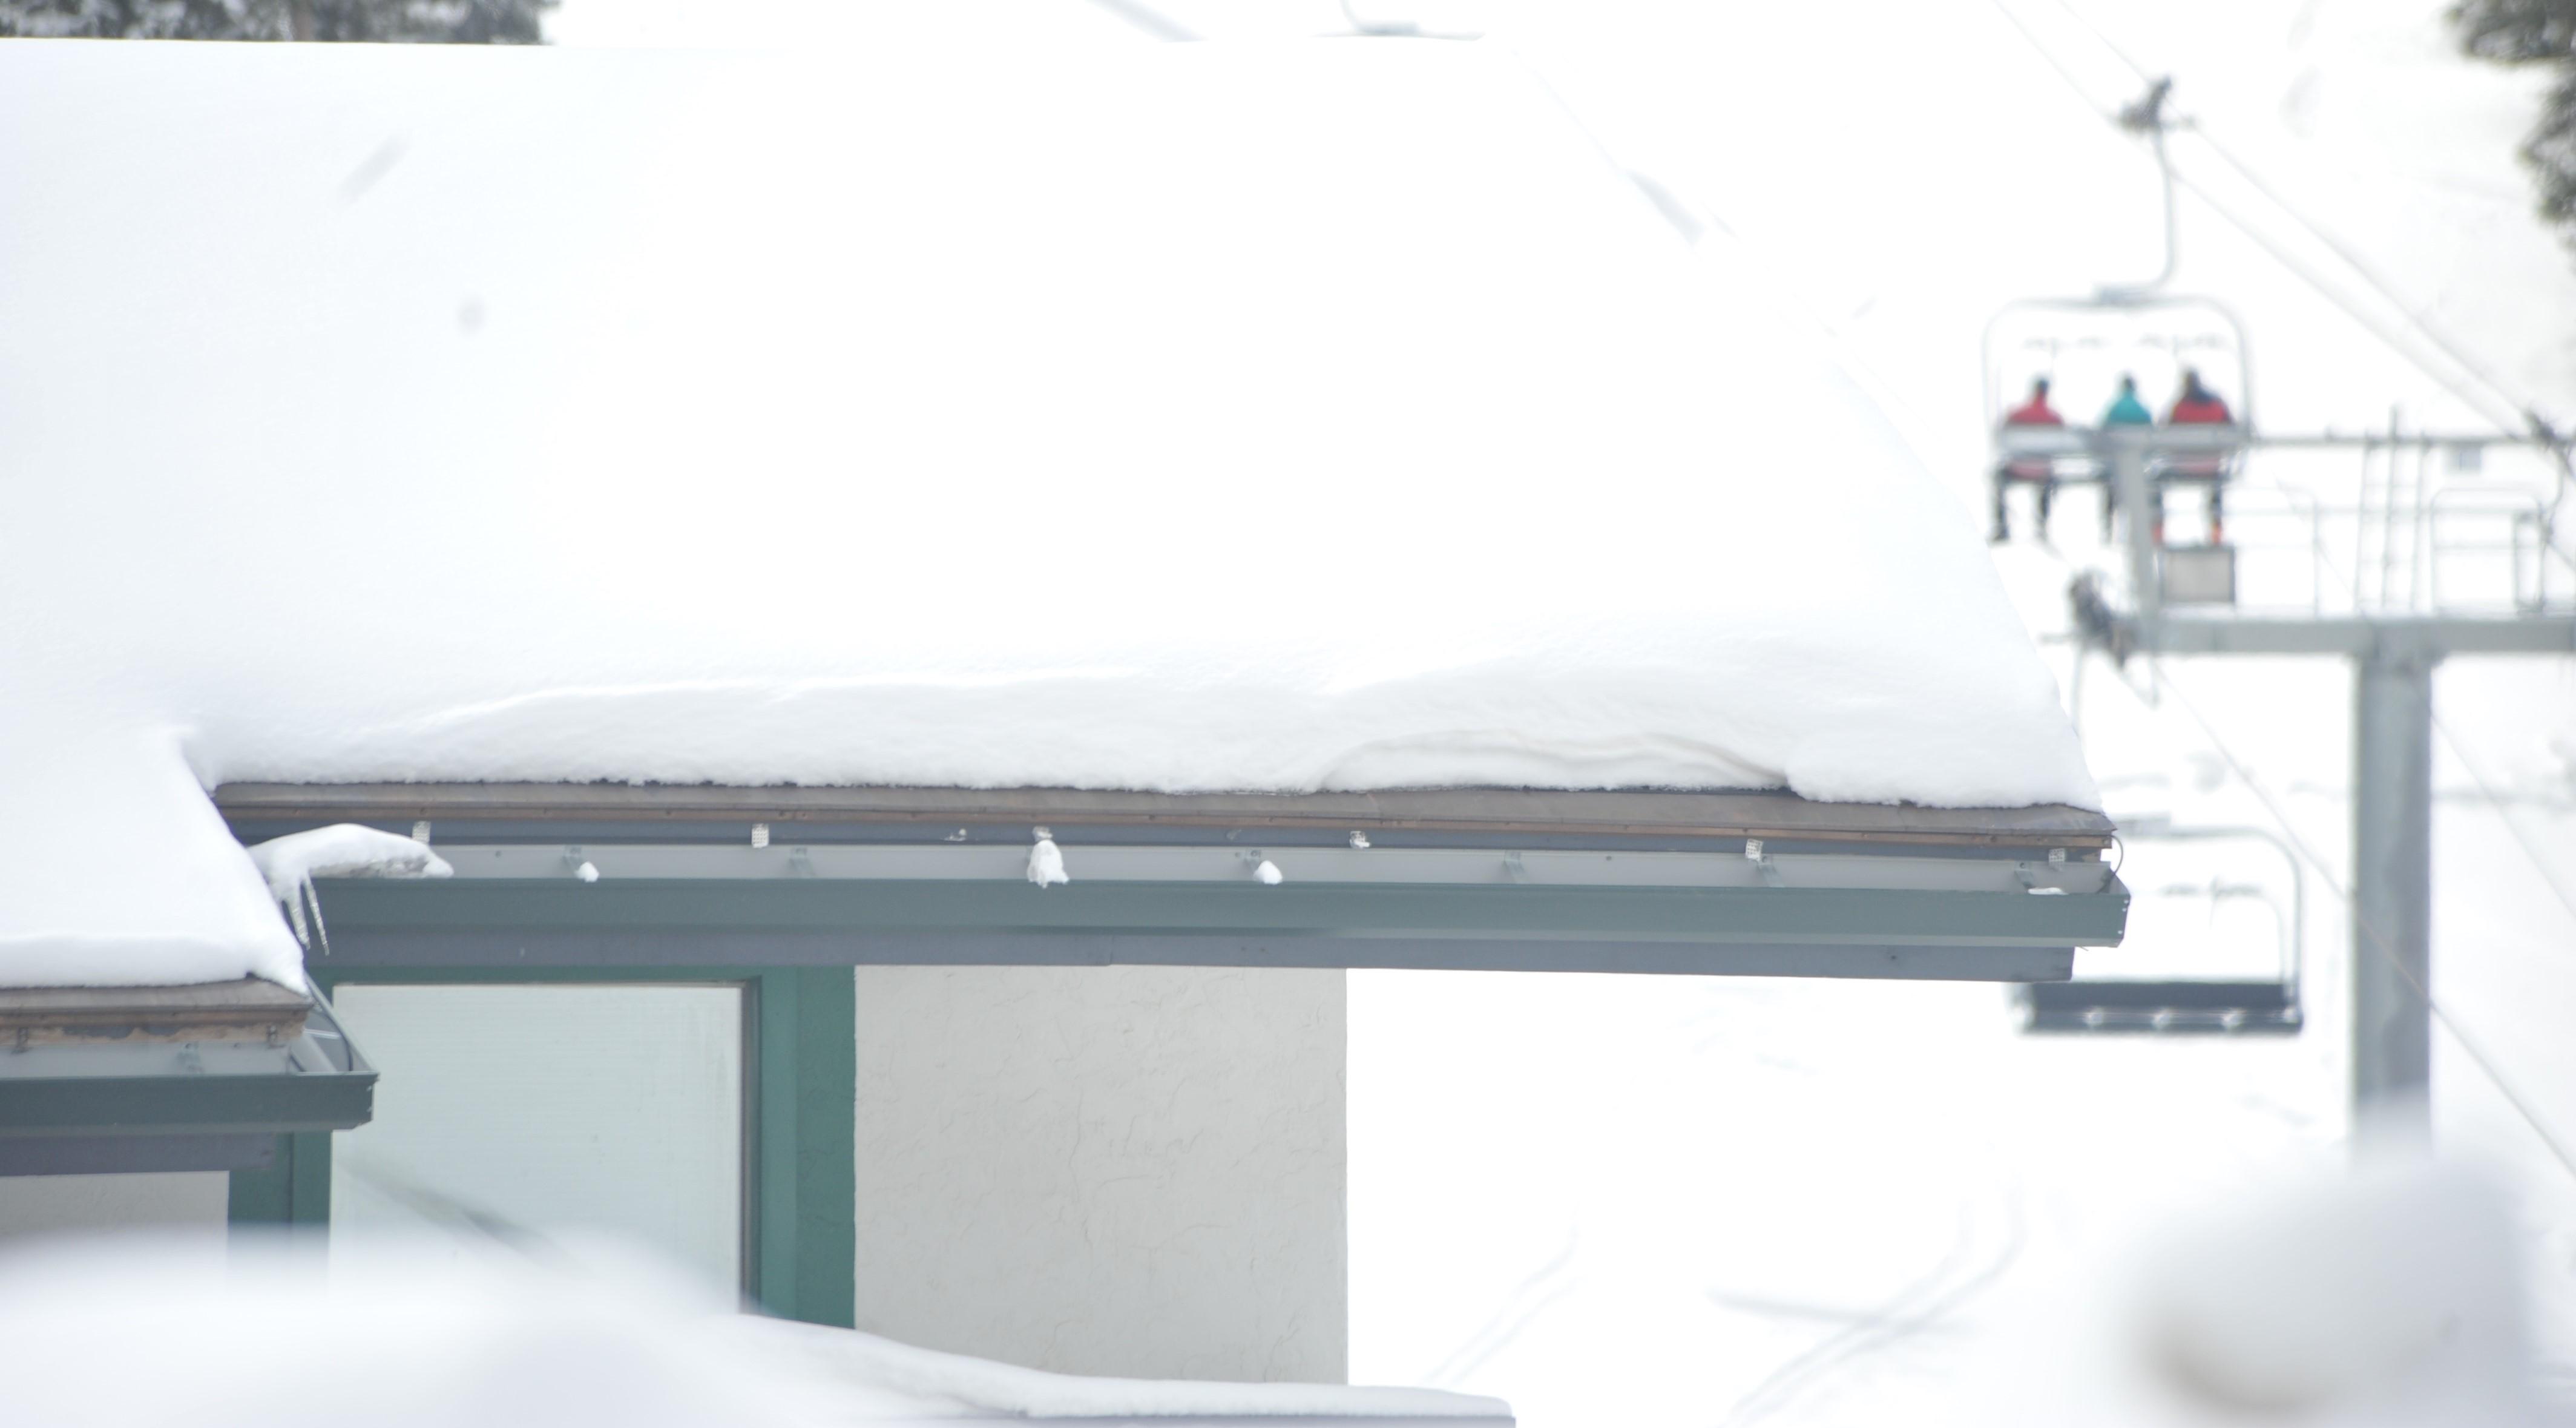 Prevent Property Damage With Ice Melt Systems For Asphalt